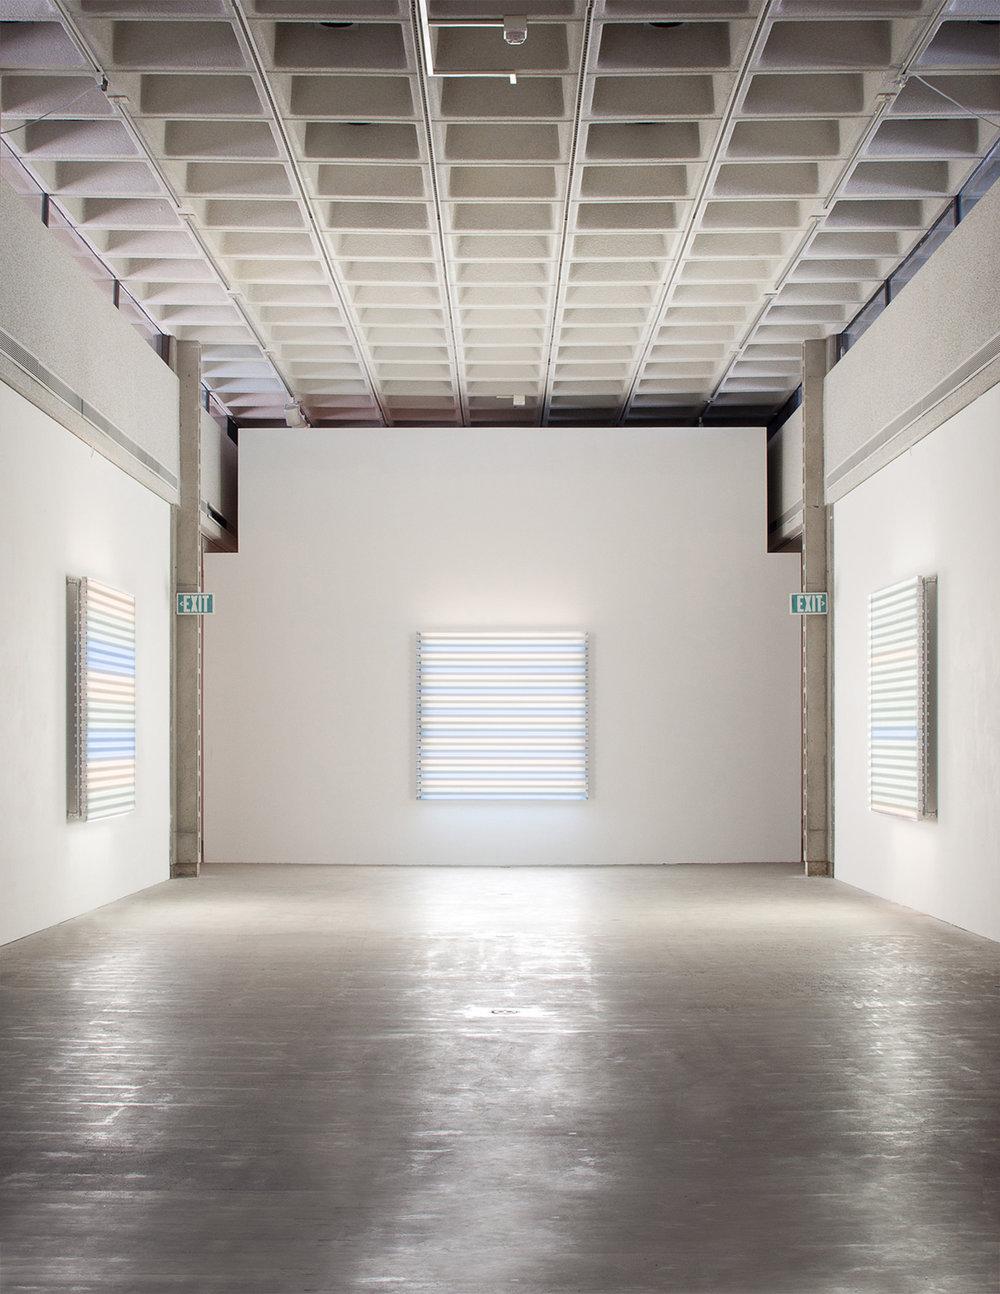 lightLINES_COLA_installation_view_1920x.jpg